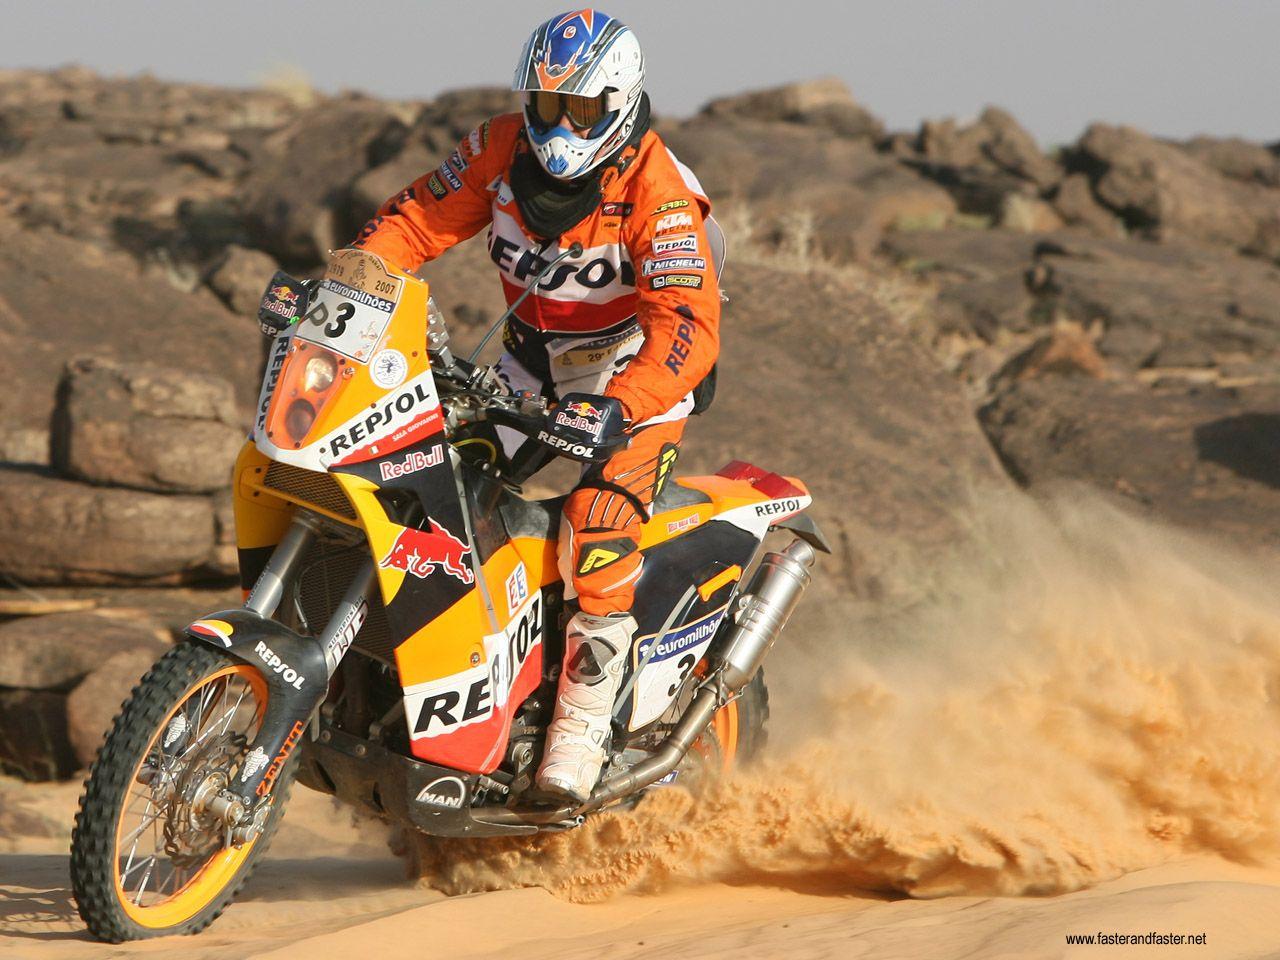 Ktm Rally Dakar Dakar Rally Pinterest Rally Bike Rally And